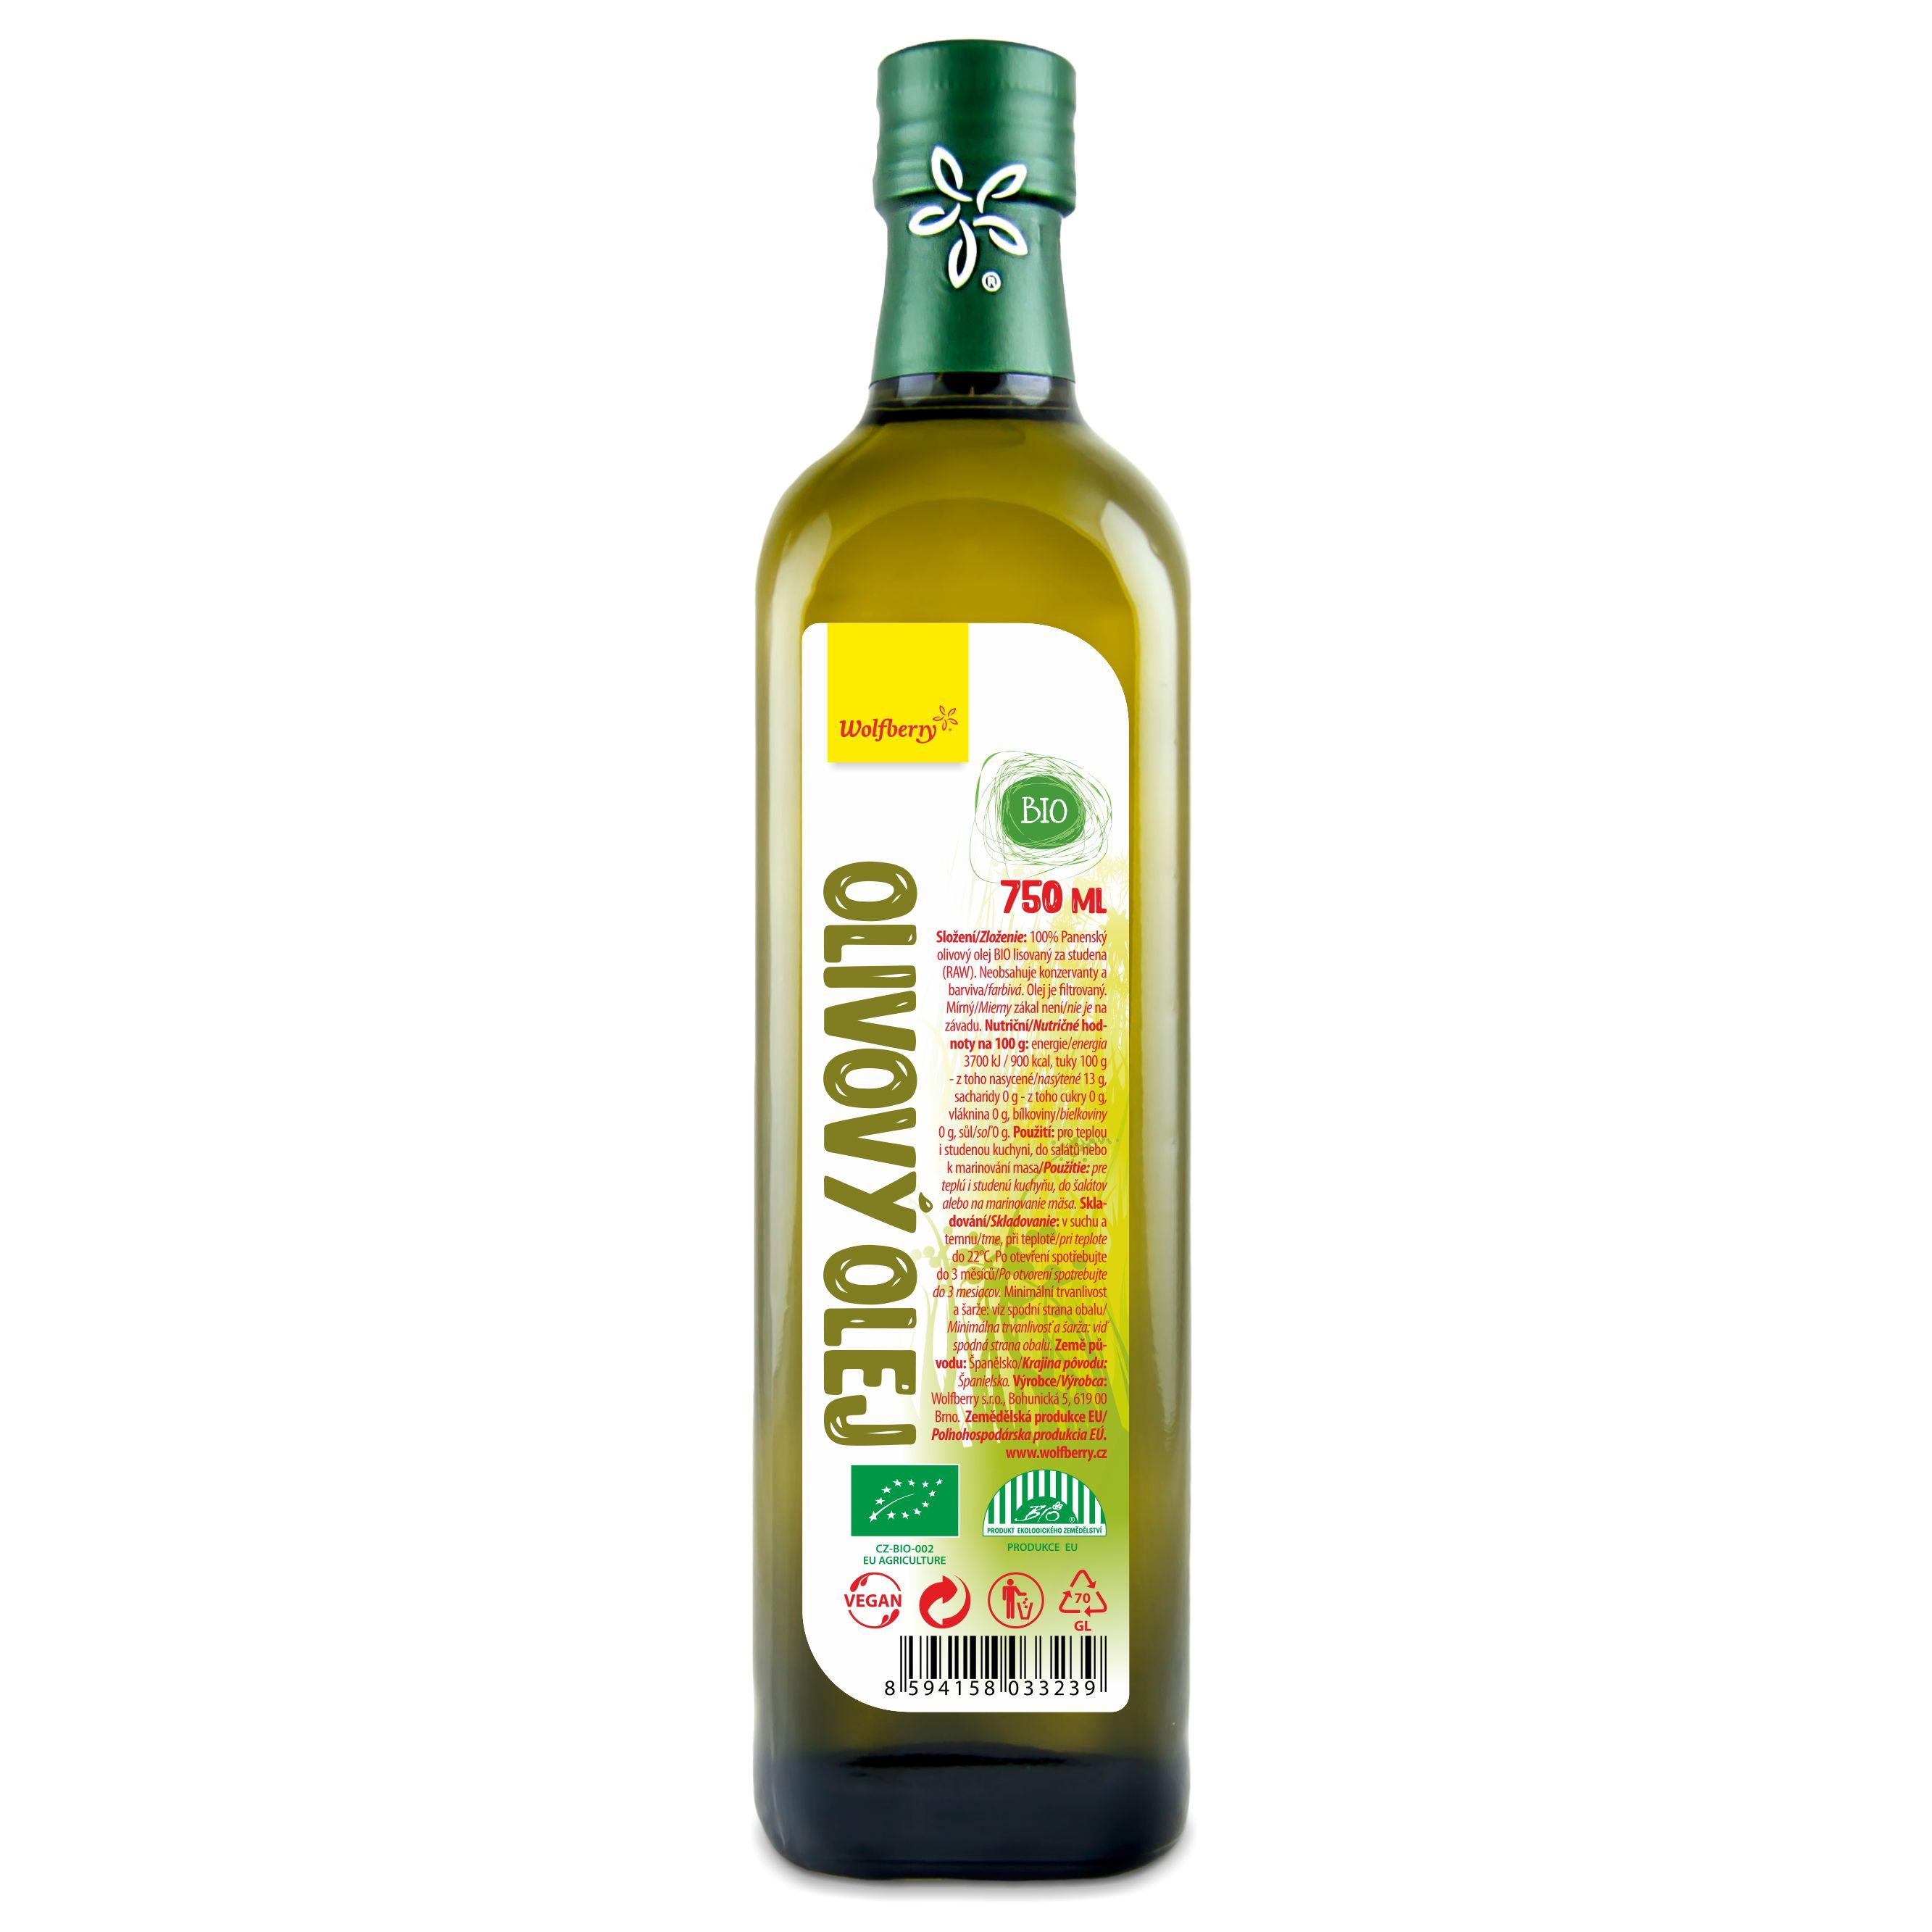 Wolfberry Olivový olej panenský BIO 750 ml Wolfberry * 750ml